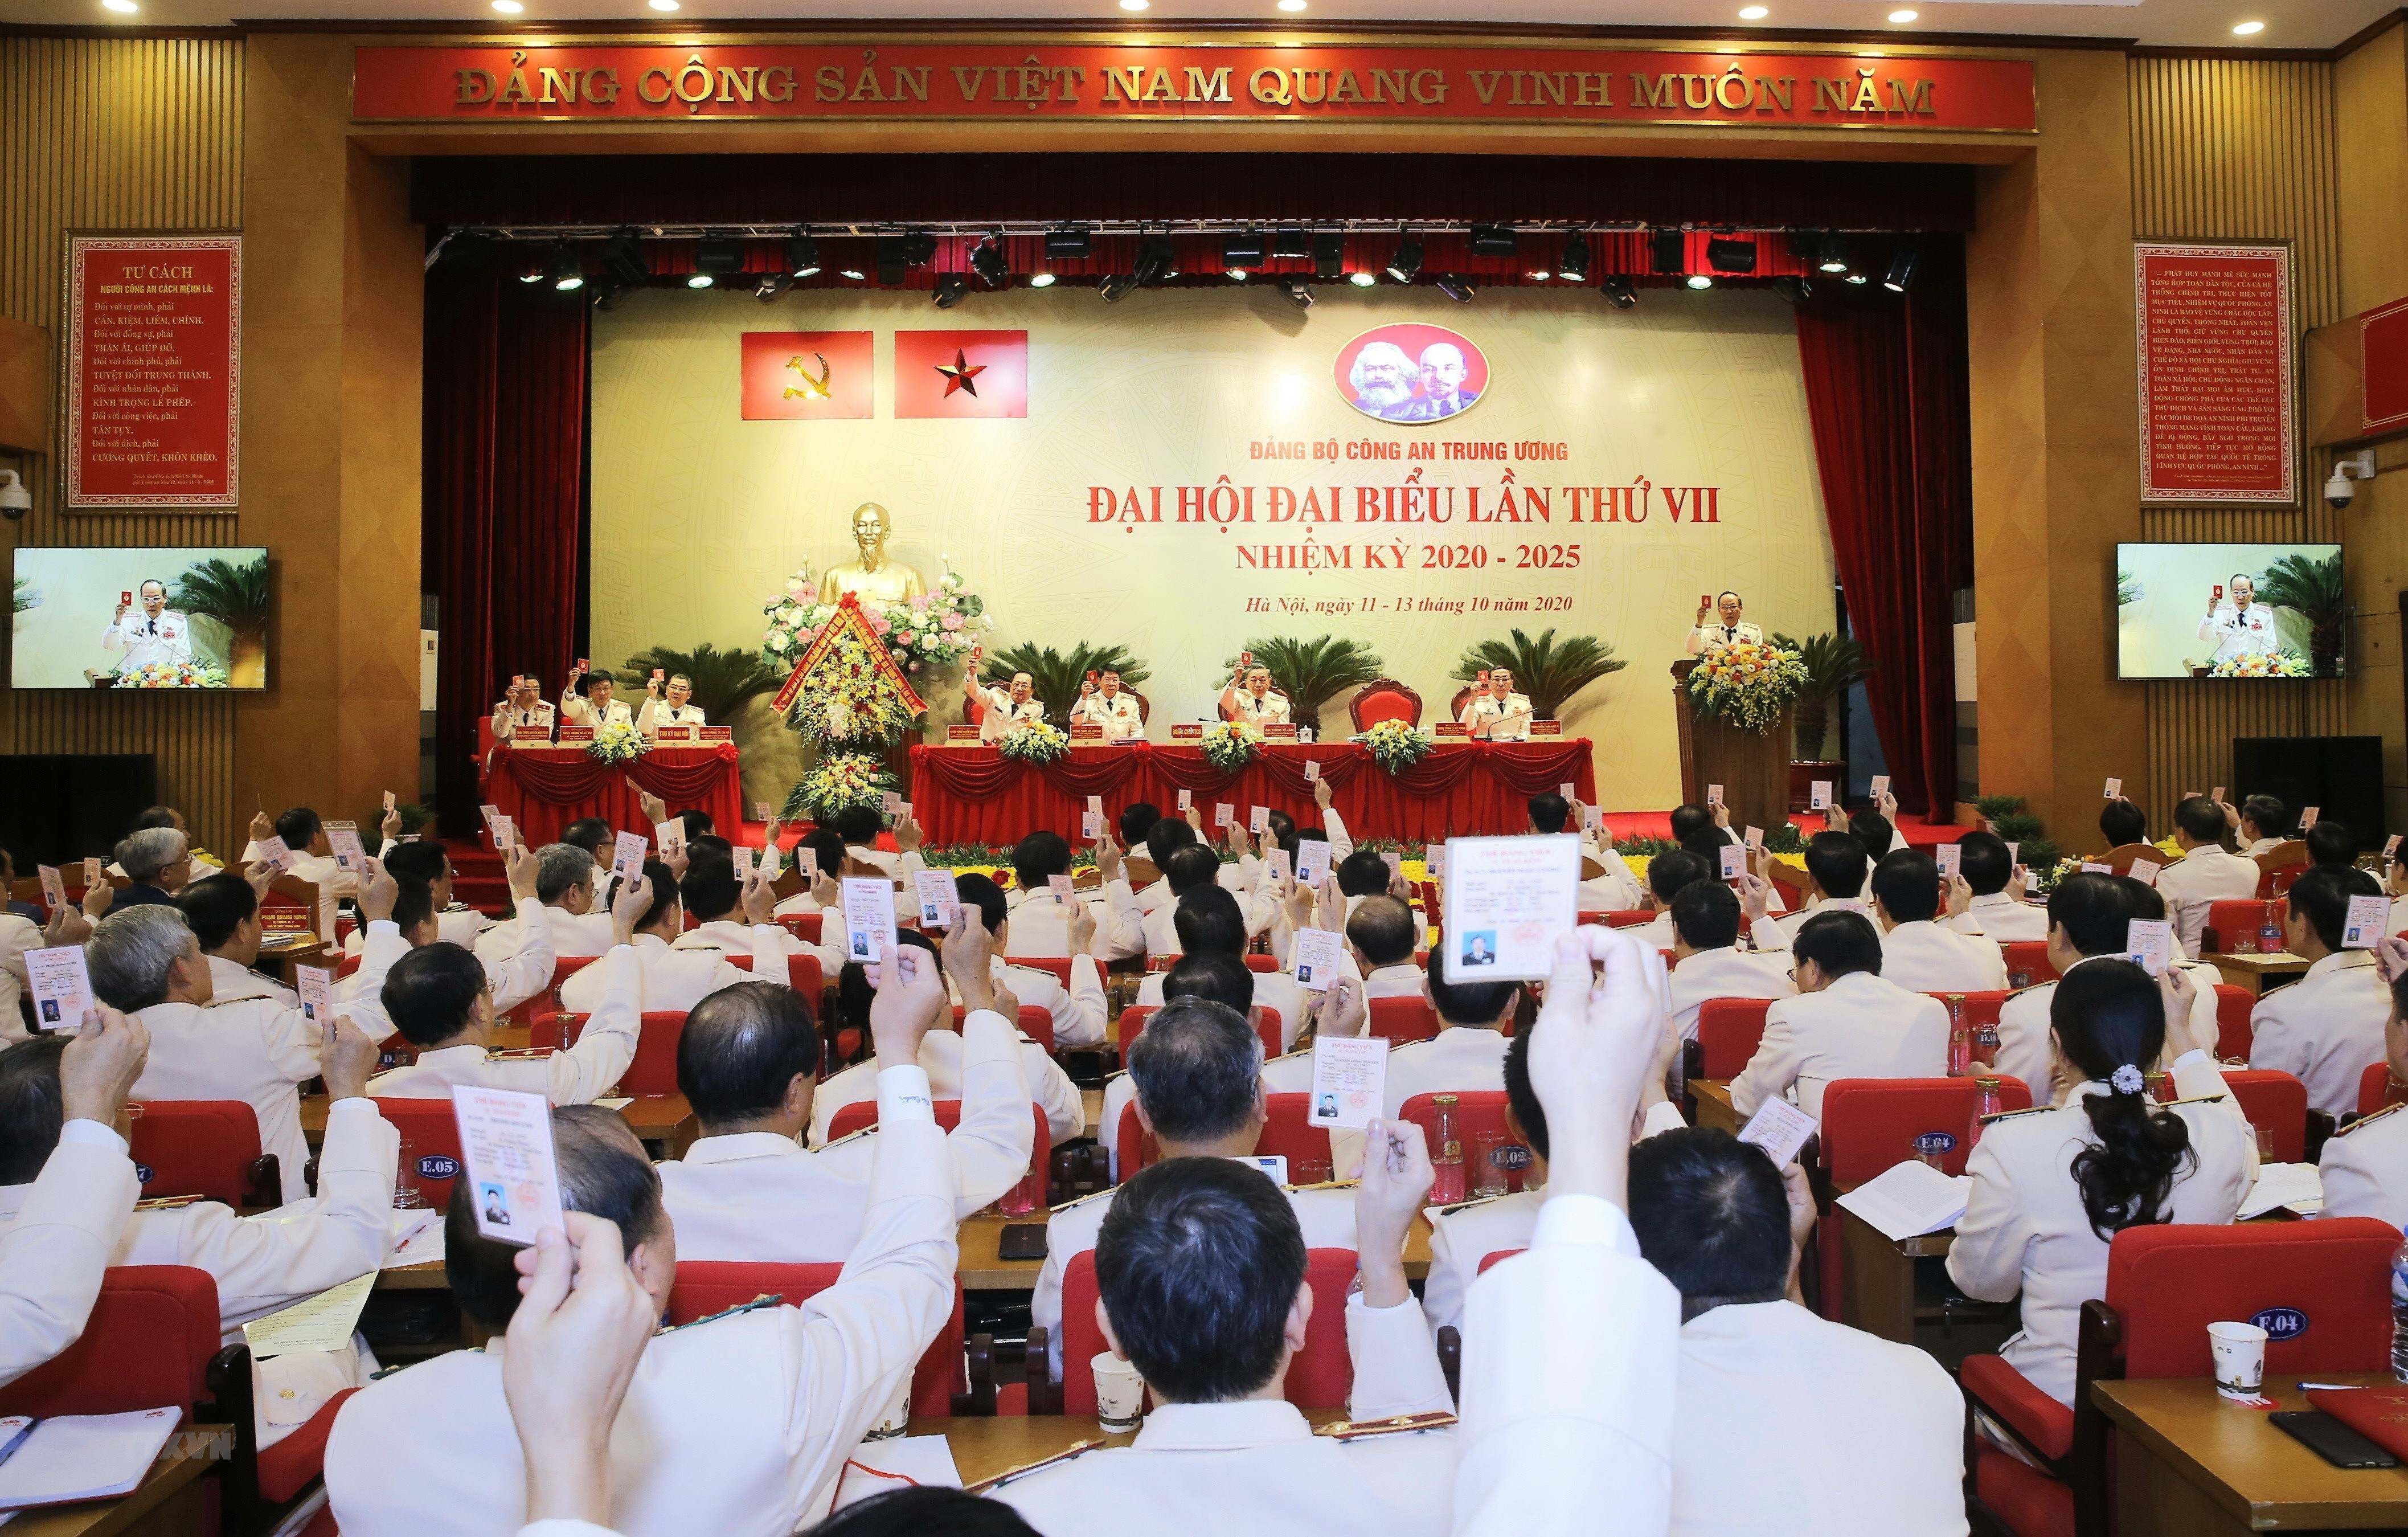 [Photo] Dai hoi dai bieu Dang bo Cong an Trung uong lan thu VII hinh anh 1